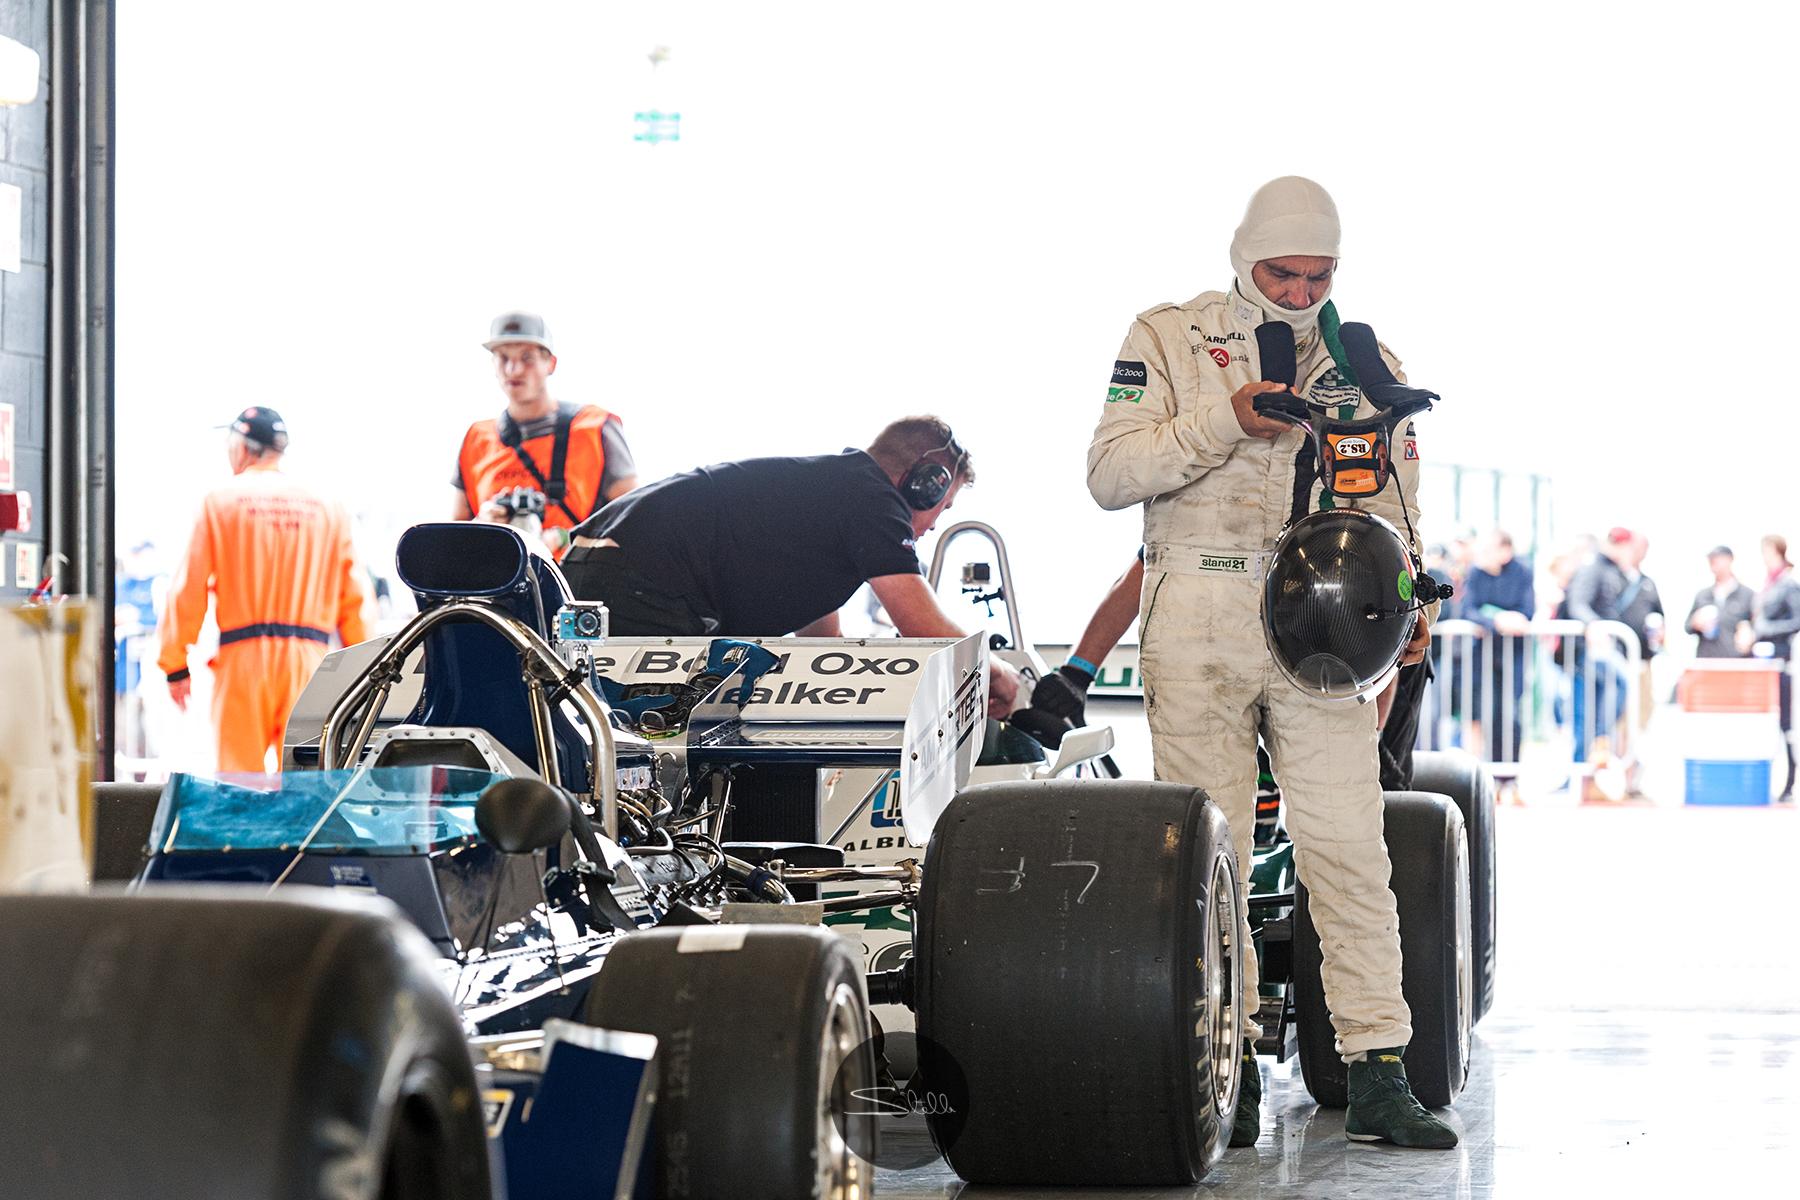 Stella Scordellis Silverstone Classic 2017 18 Watermarked.jpg